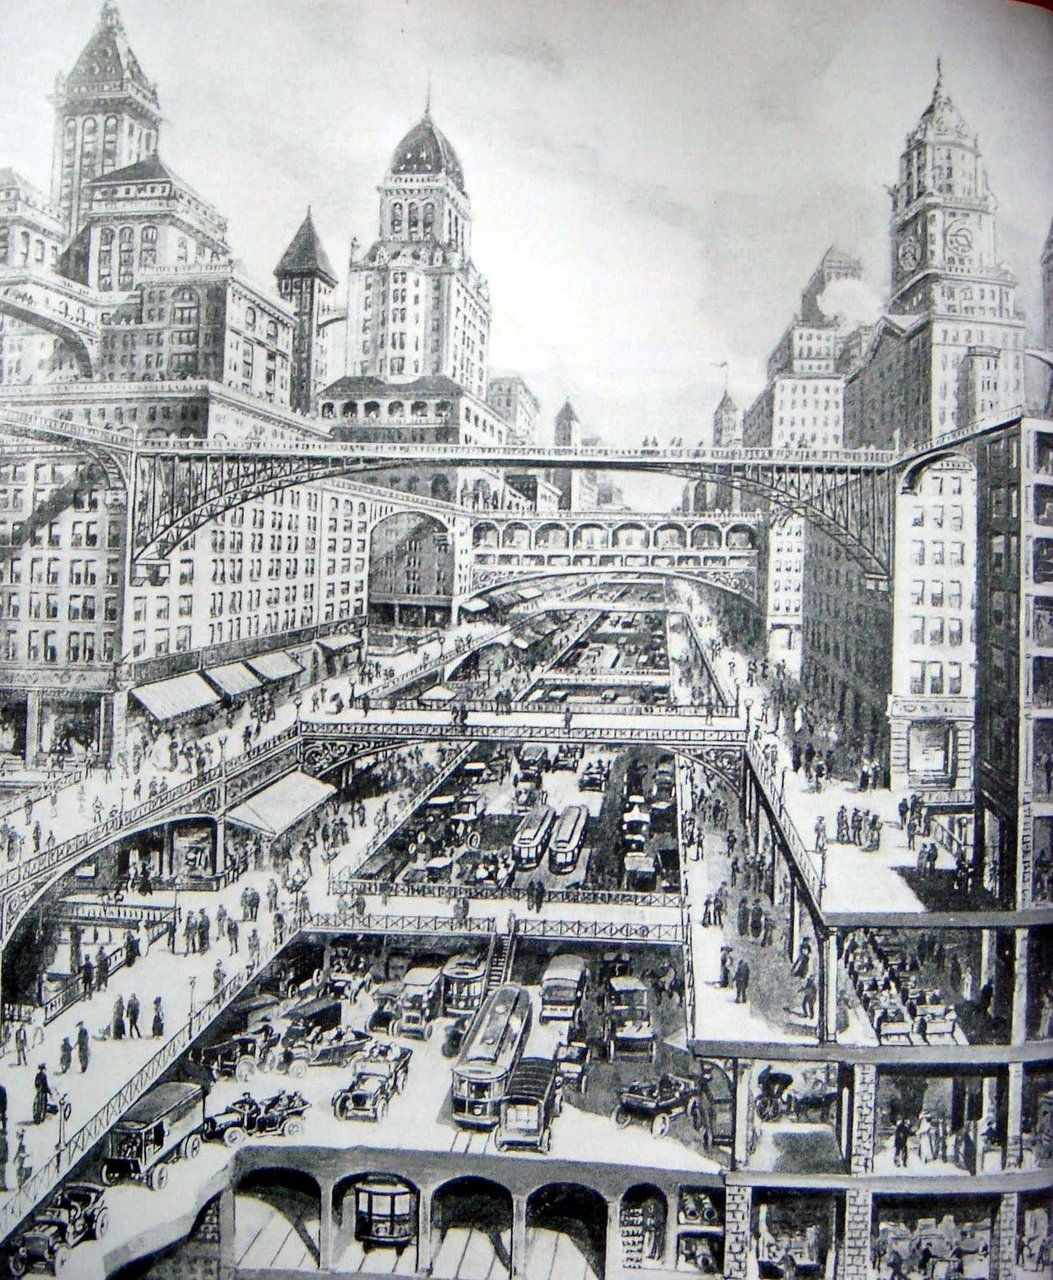 City Of The Future By Harvey Wiley Corbett 1913 From Parisdeuxieme Via Missmoonpie Vintagefuture